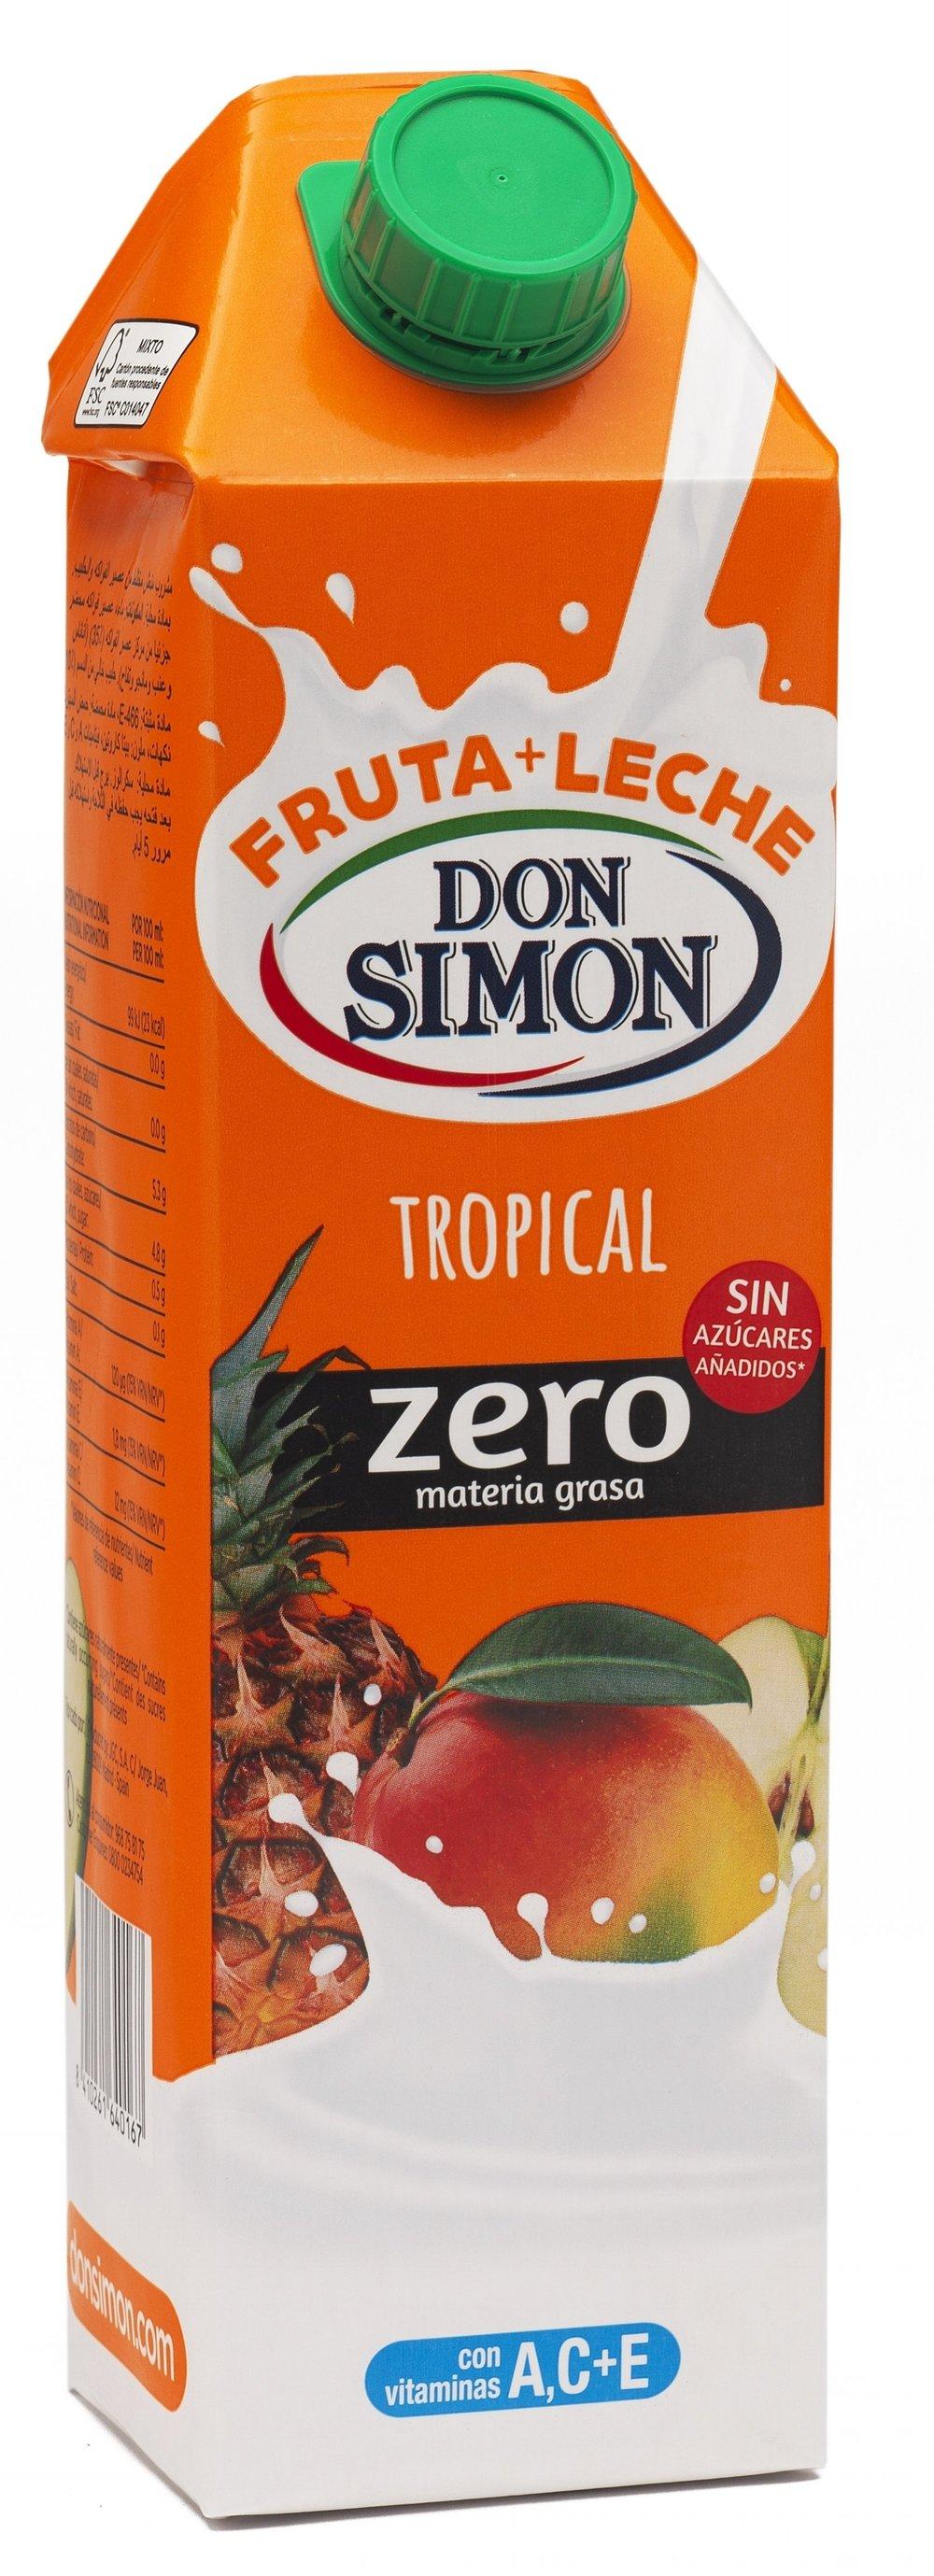 Fruta-leche tropical